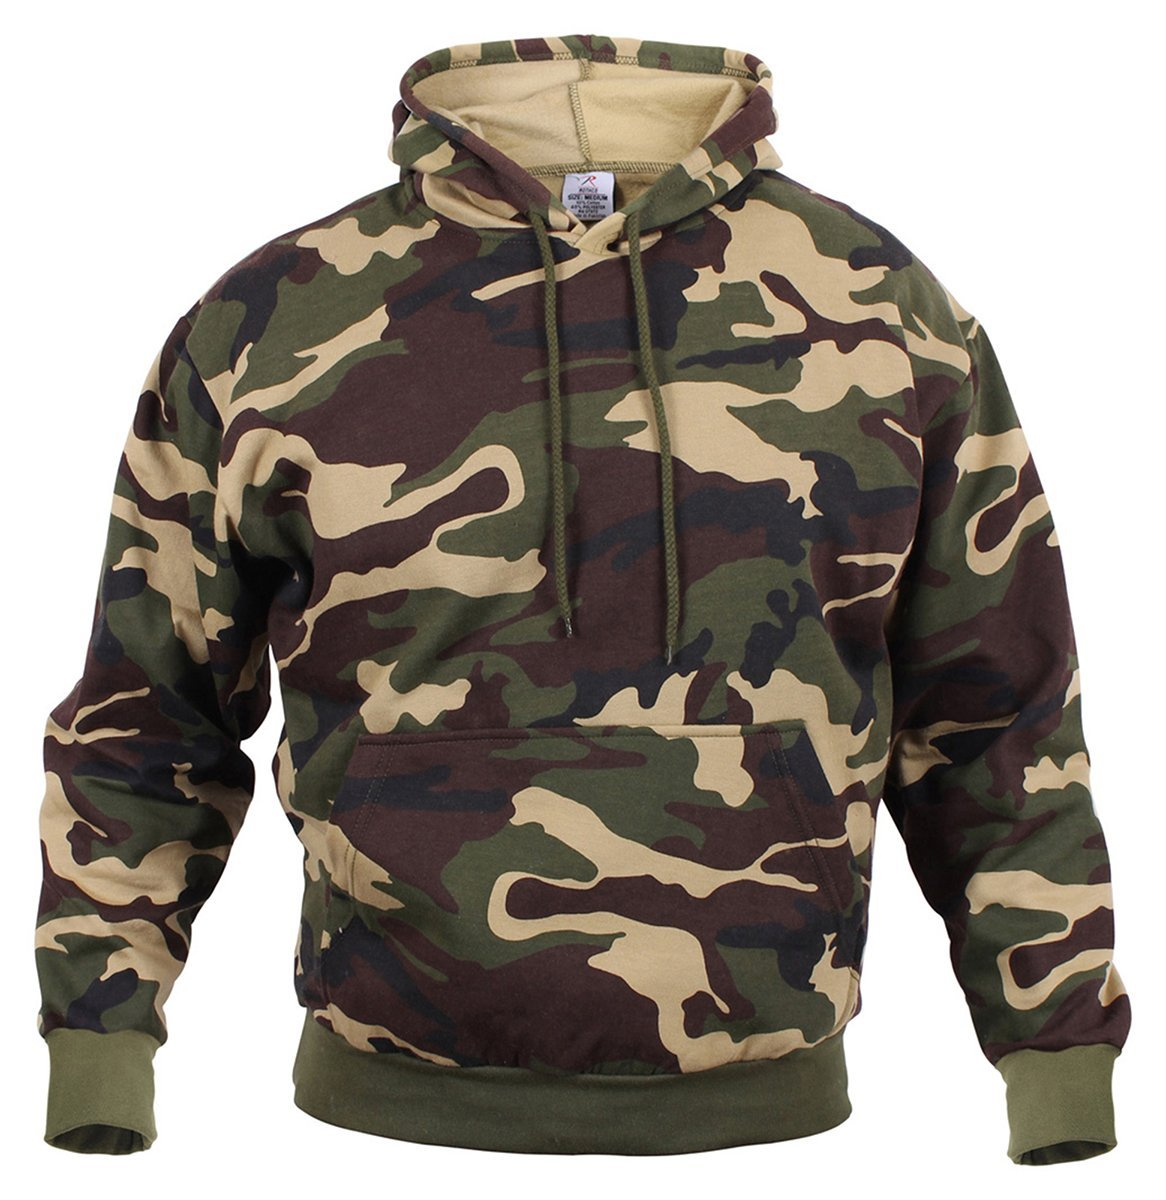 Rothco Camo Pullover Hooded Sweatshirt - Woodland Camo 8e62b3106ea